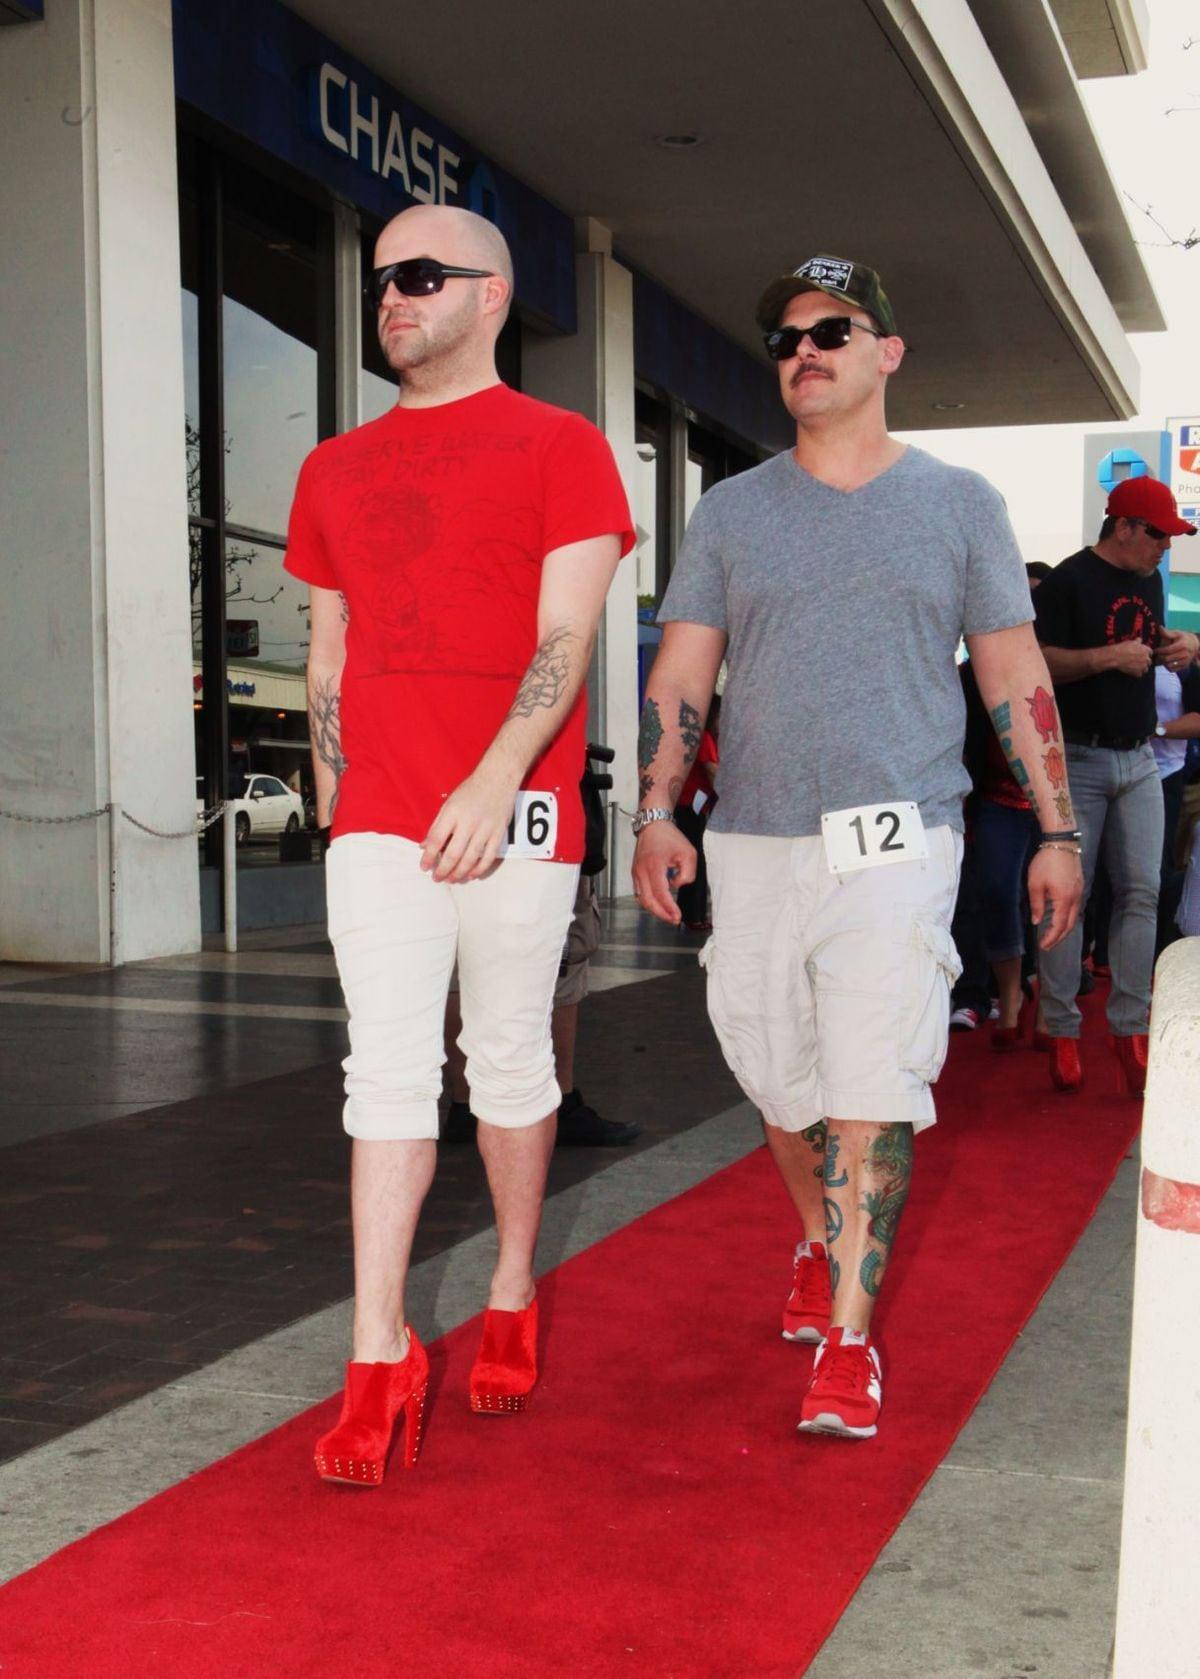 10th Red High Heels Walk